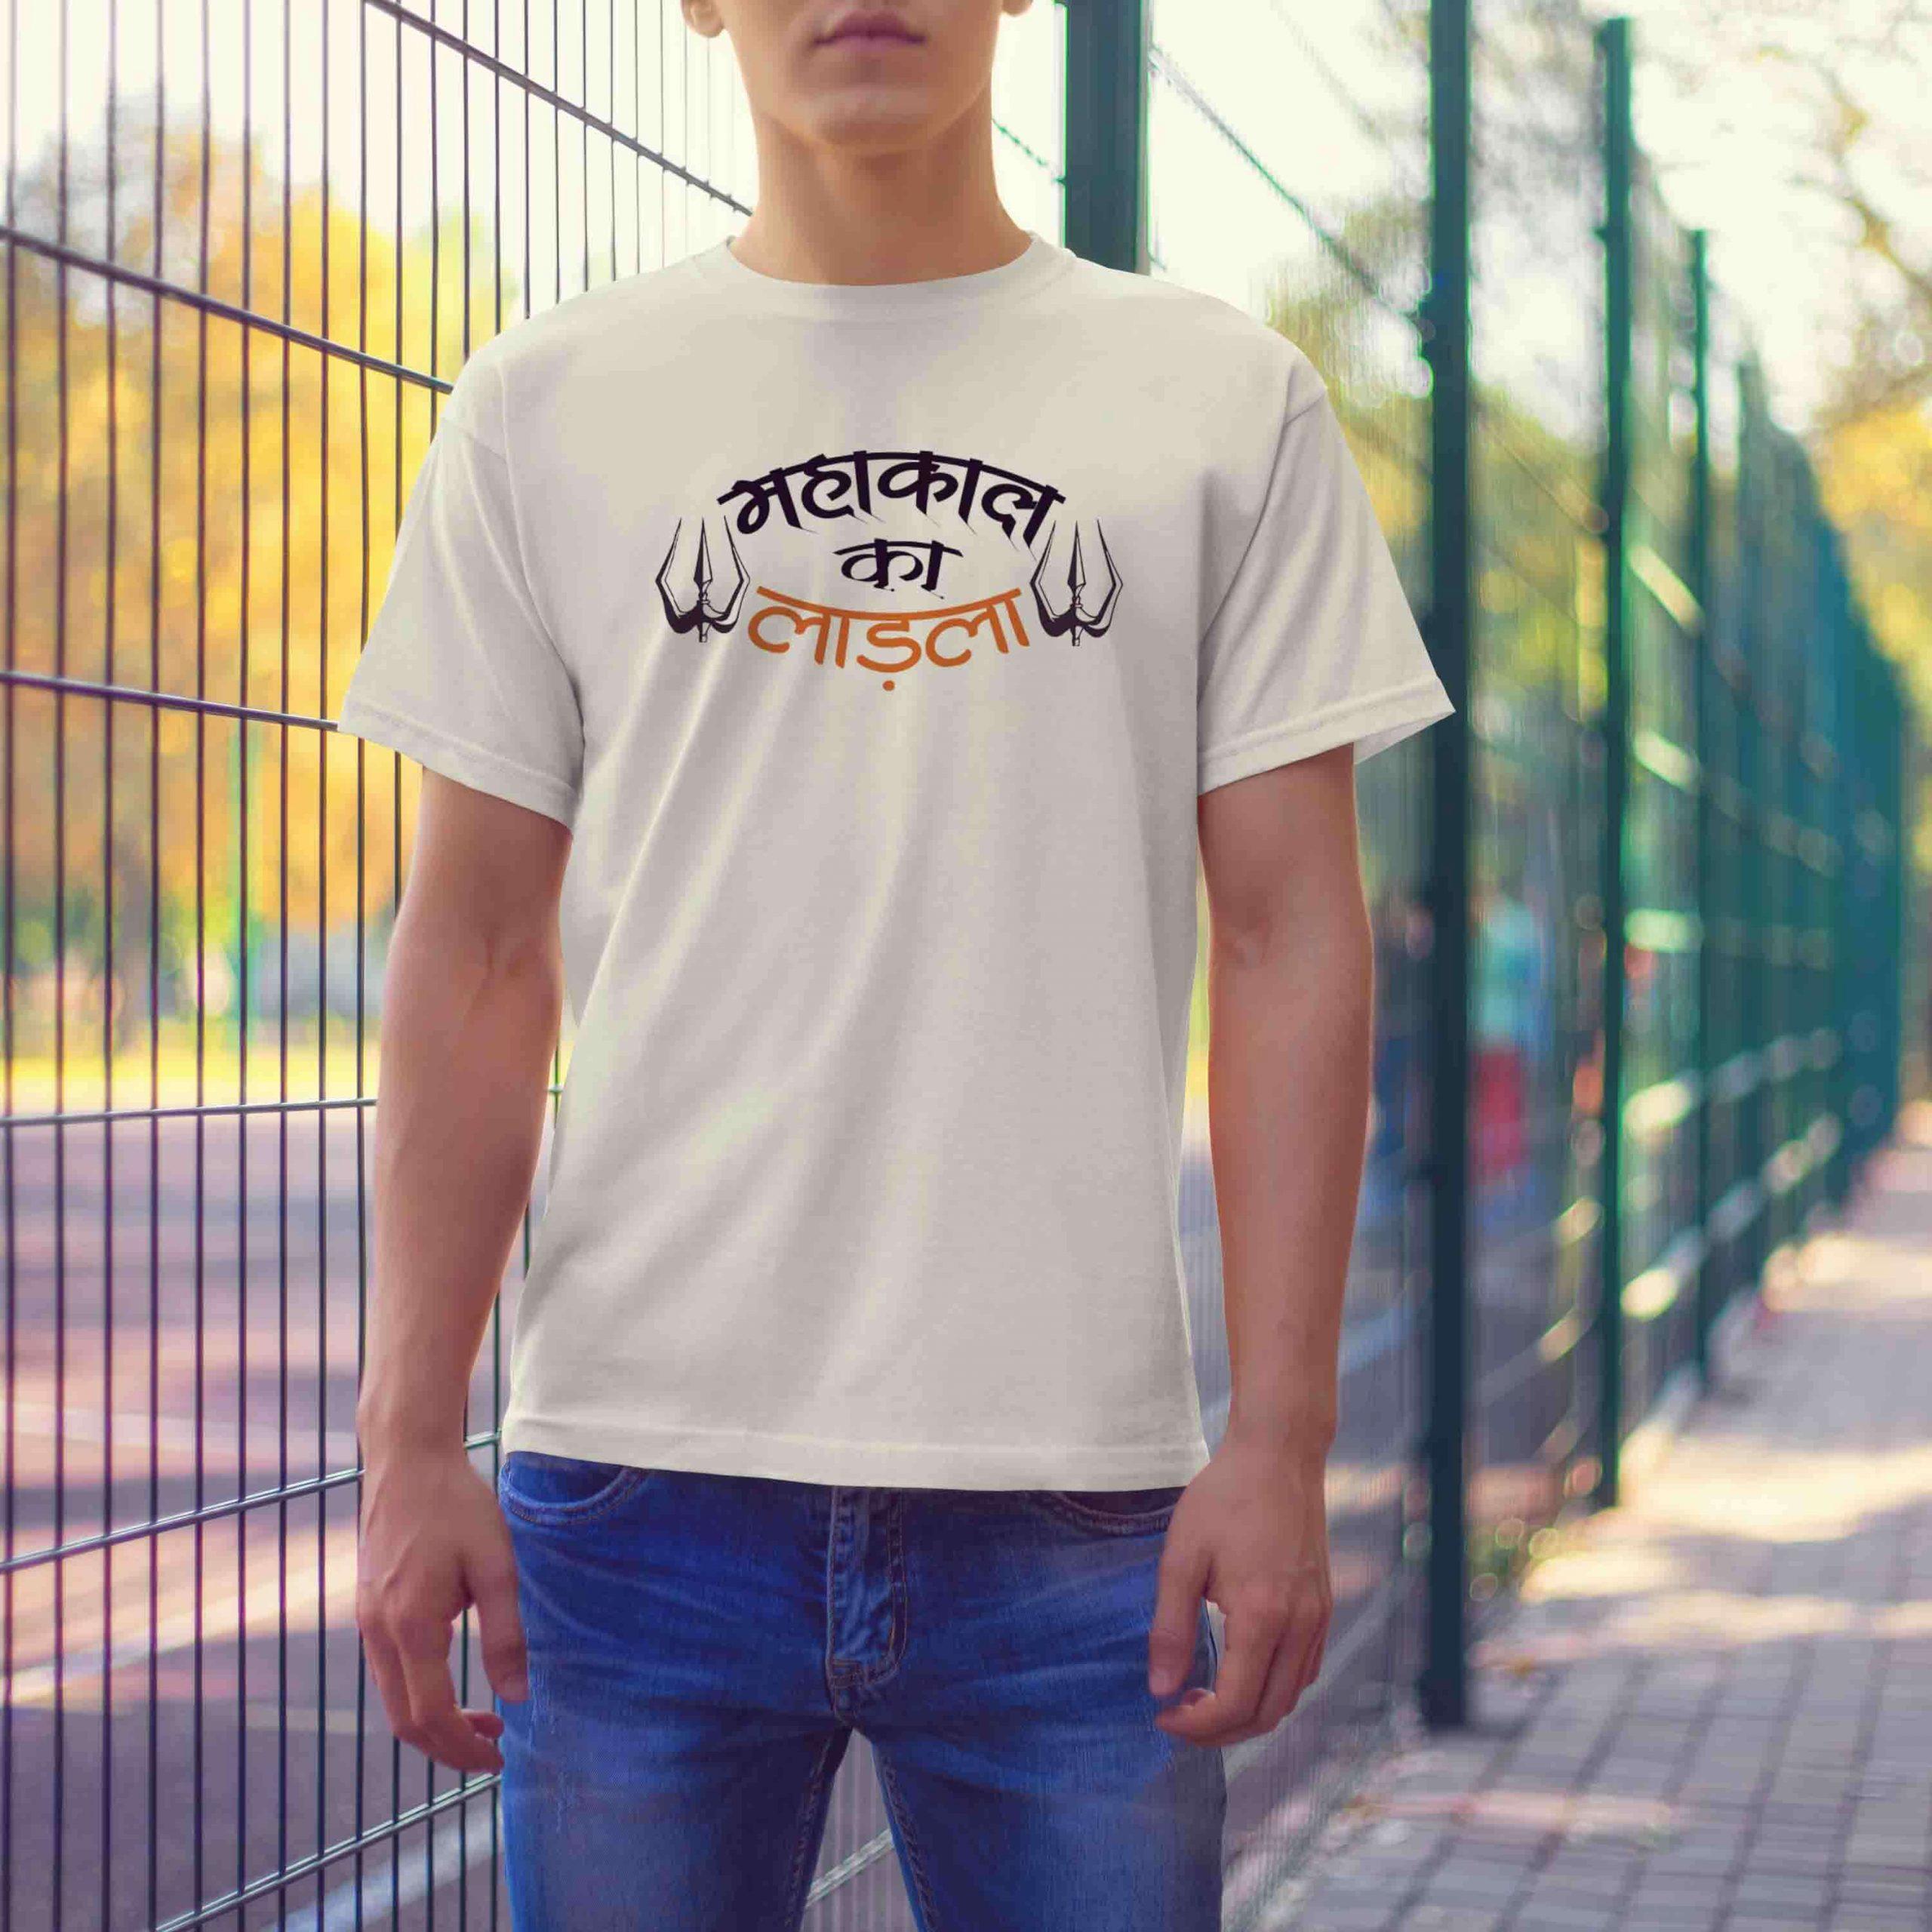 Mahakal ka ladla status printed white t-shirt